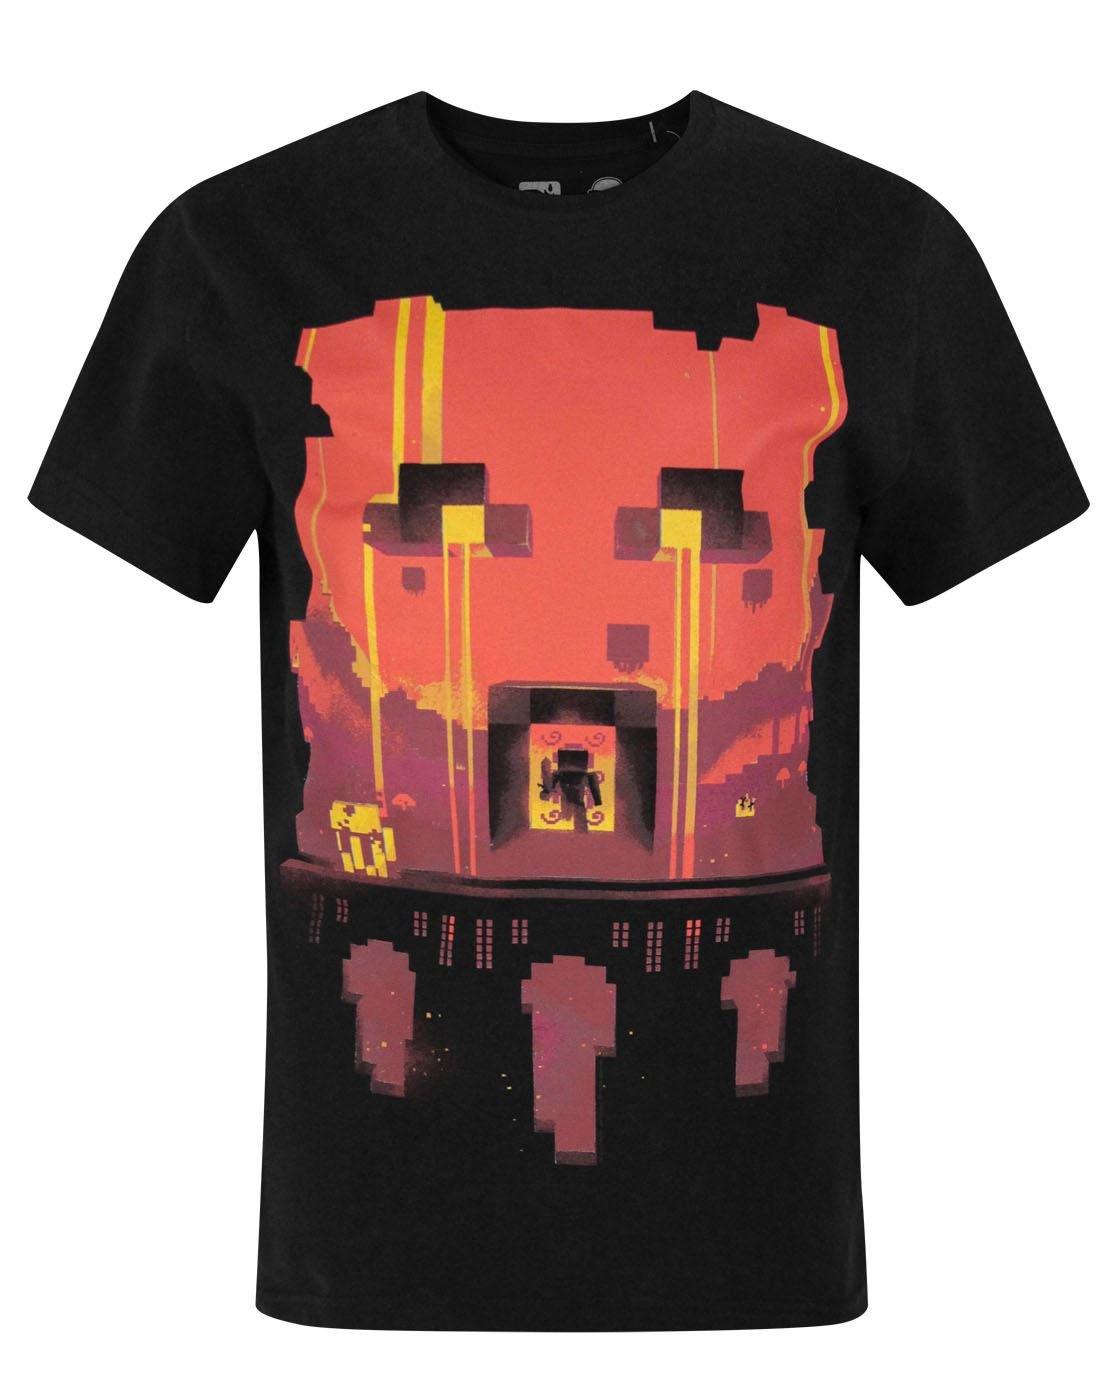 Minecraft - Camiseta de Manga Corta Oficial Modelo Glimpse Design para niños